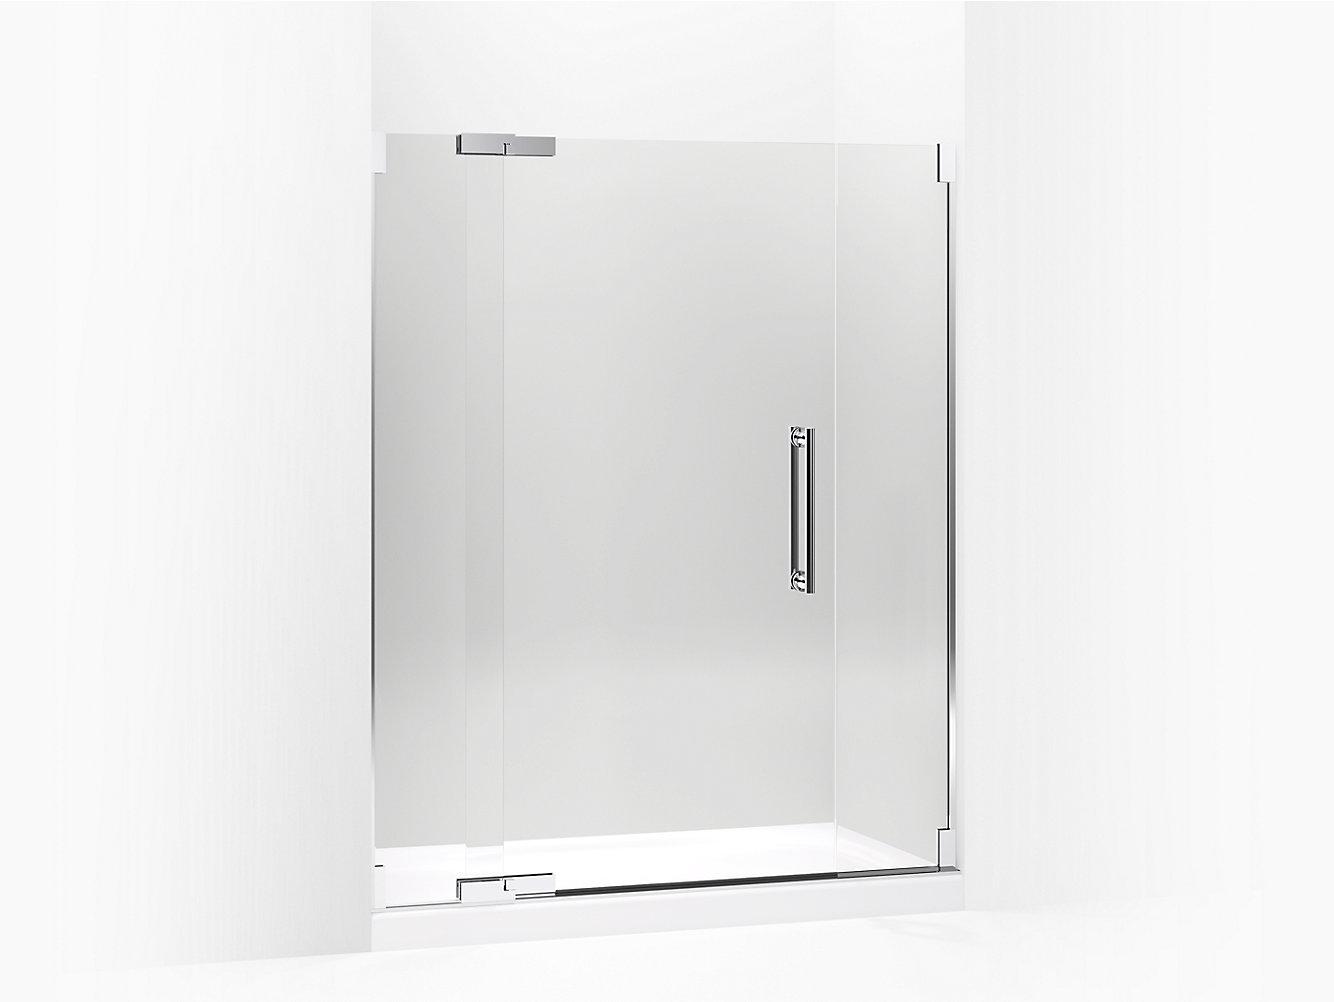 Kohler 705705 L Purist Pivot Shower Door 72 14 H X 57 14